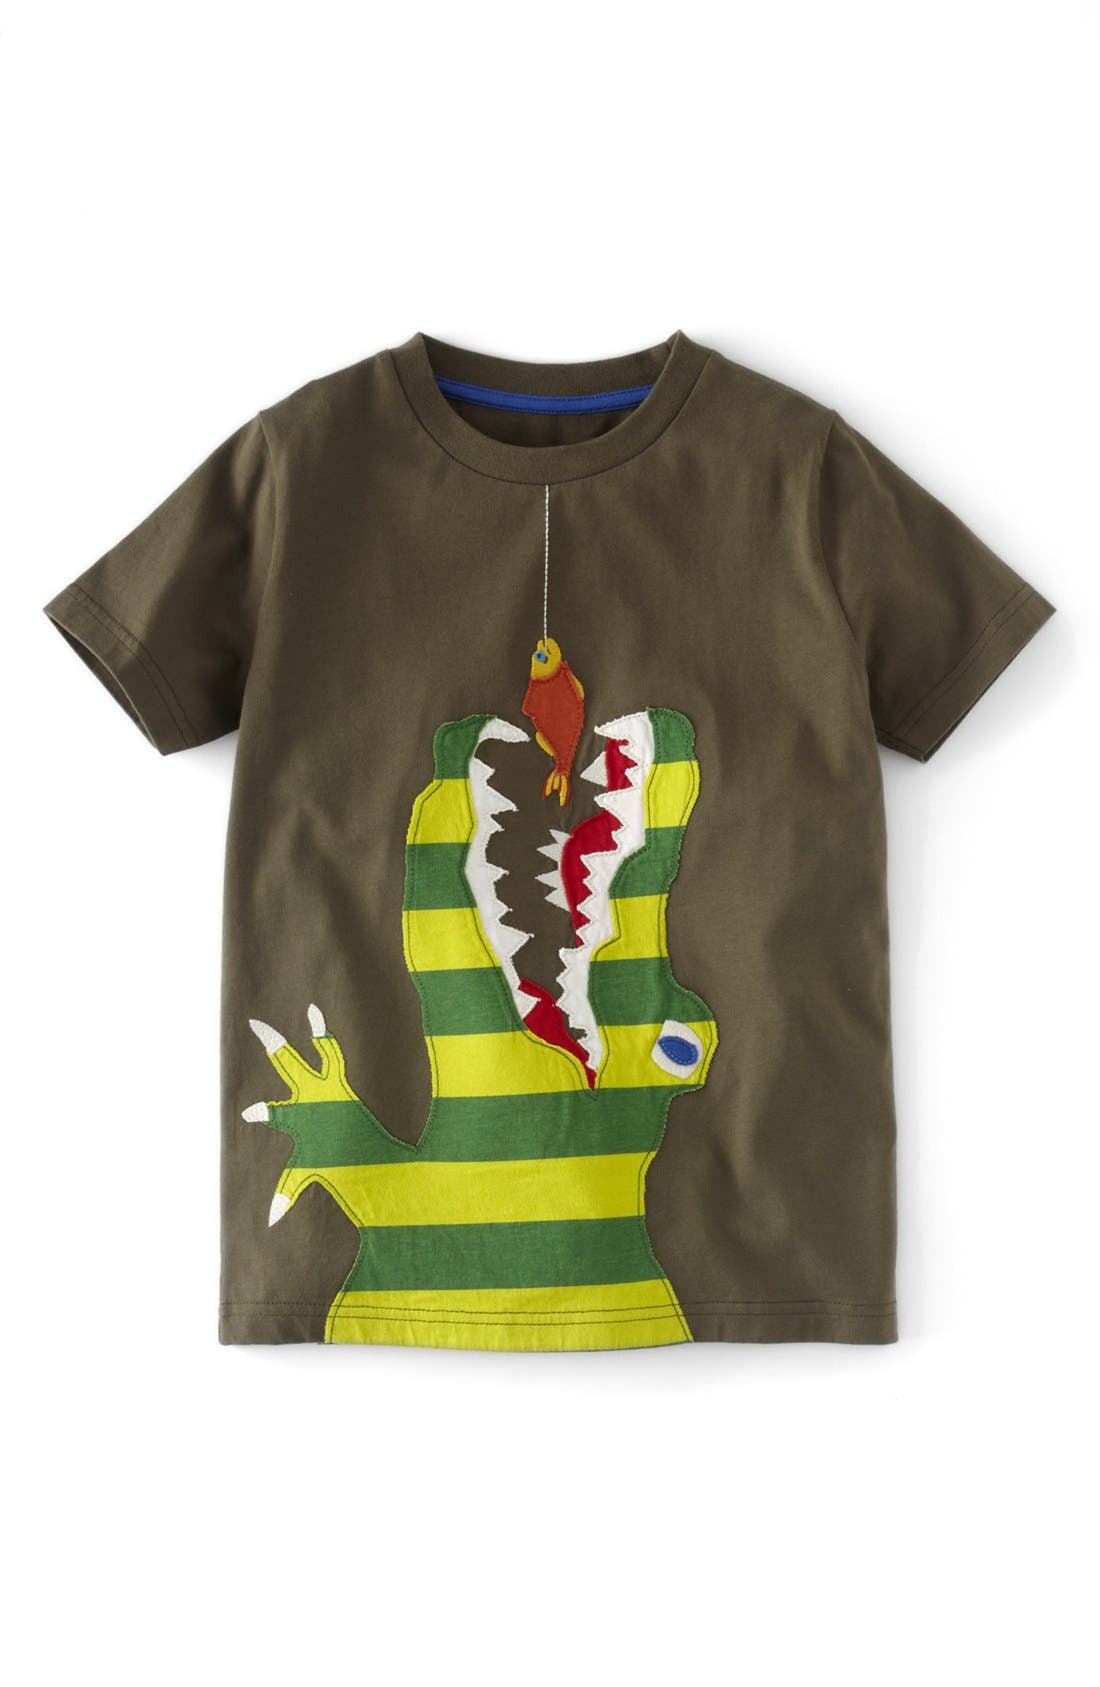 Main Image - Mini Boden 'Big Appliqué' Short Sleeve T-Shirt (Toddler Boys, Little Boys & Big Boys)